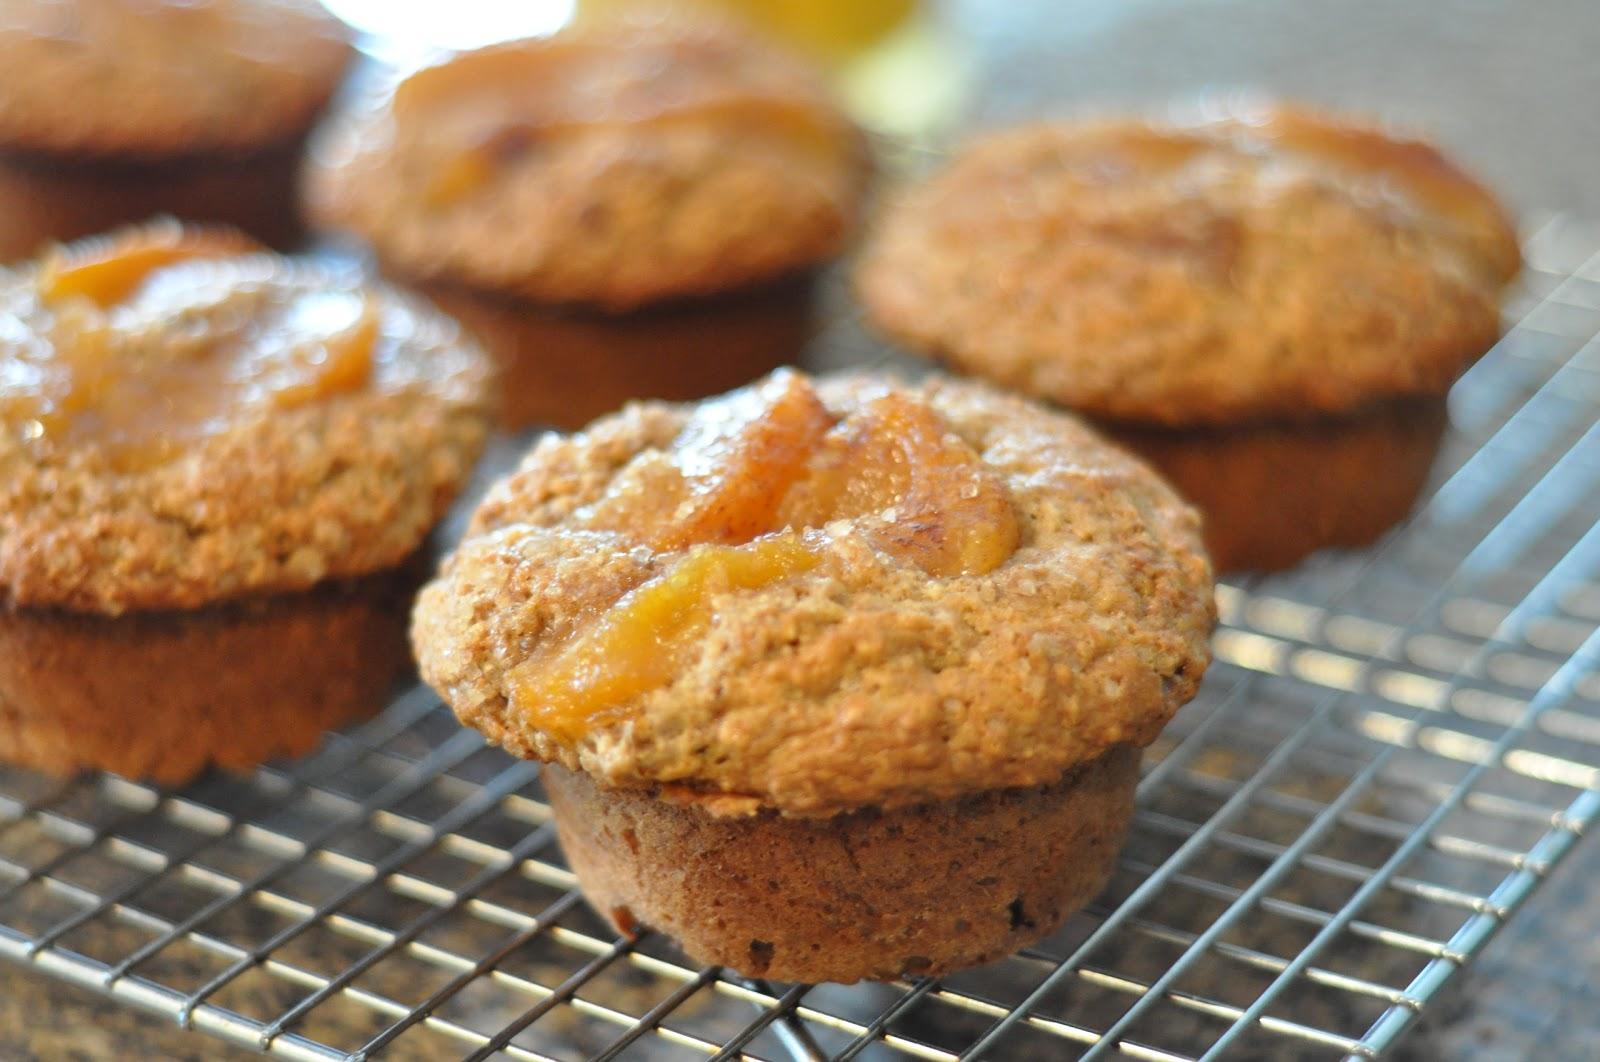 cake rumble: Peach Cinnamon Muffins